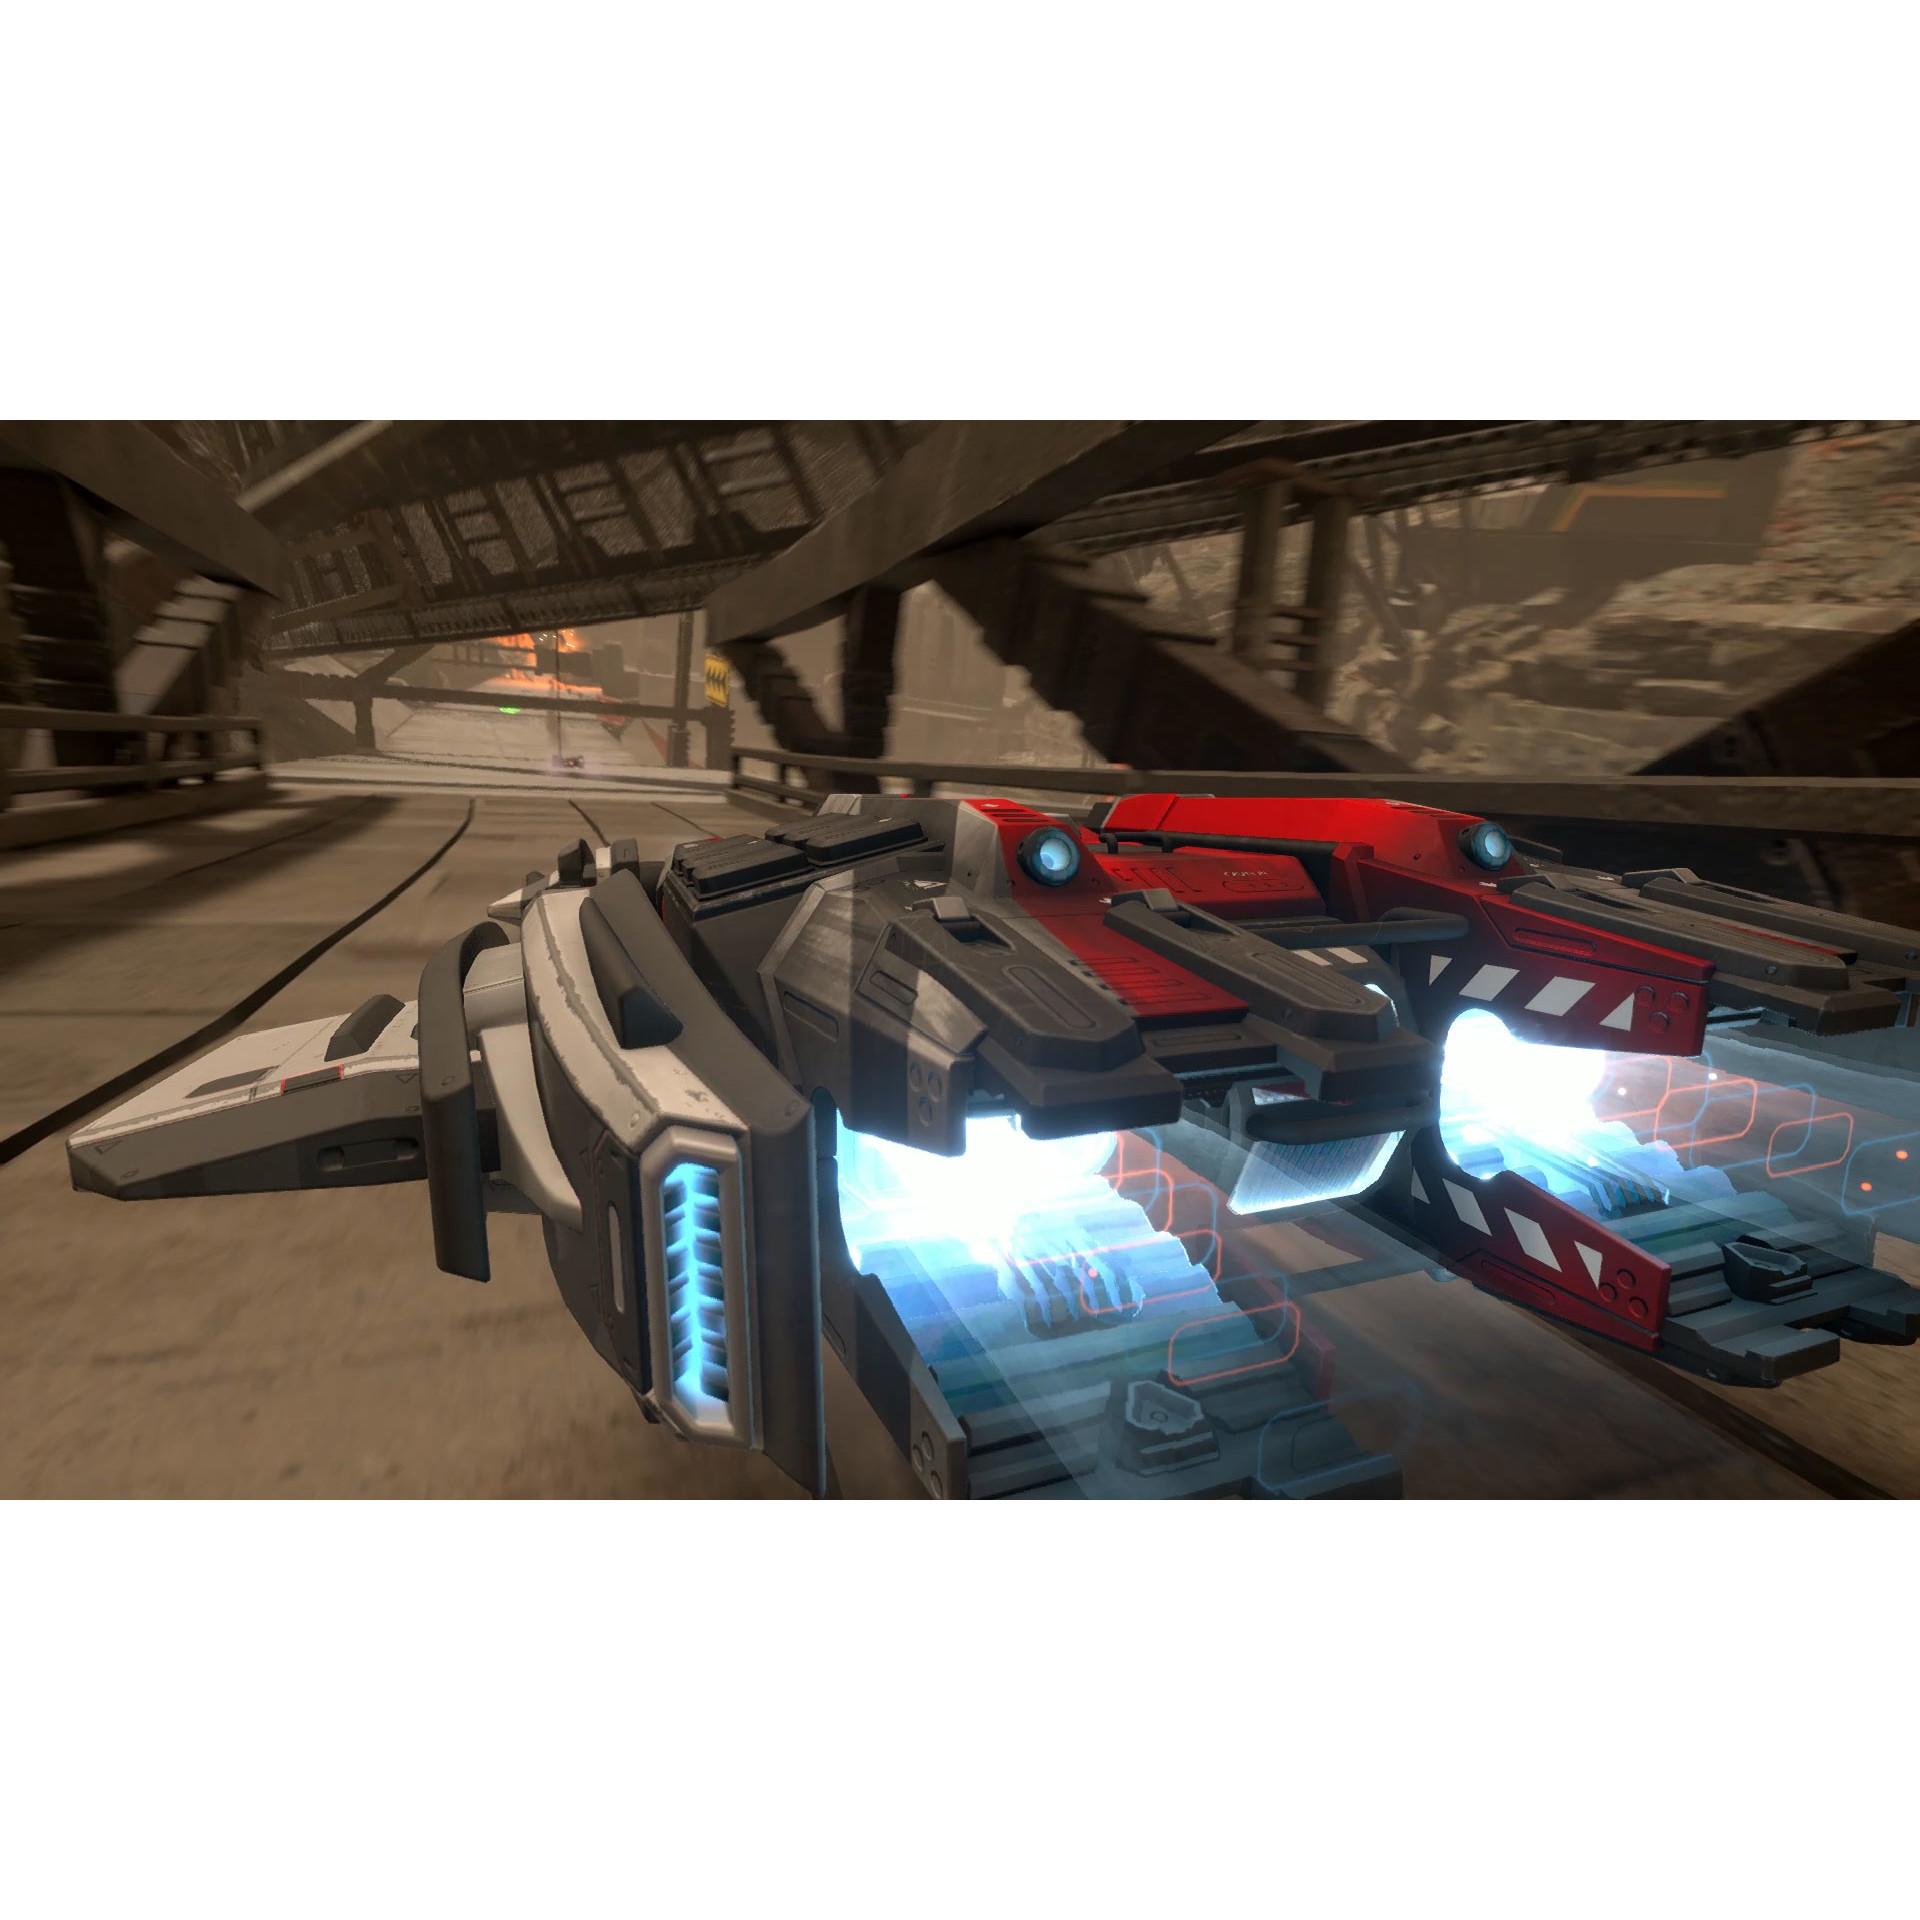 Joc GRIP: Combat Racing - Airblades vs Rollers - Ultimate Edition (EU) Pentru PlayStation 4 5